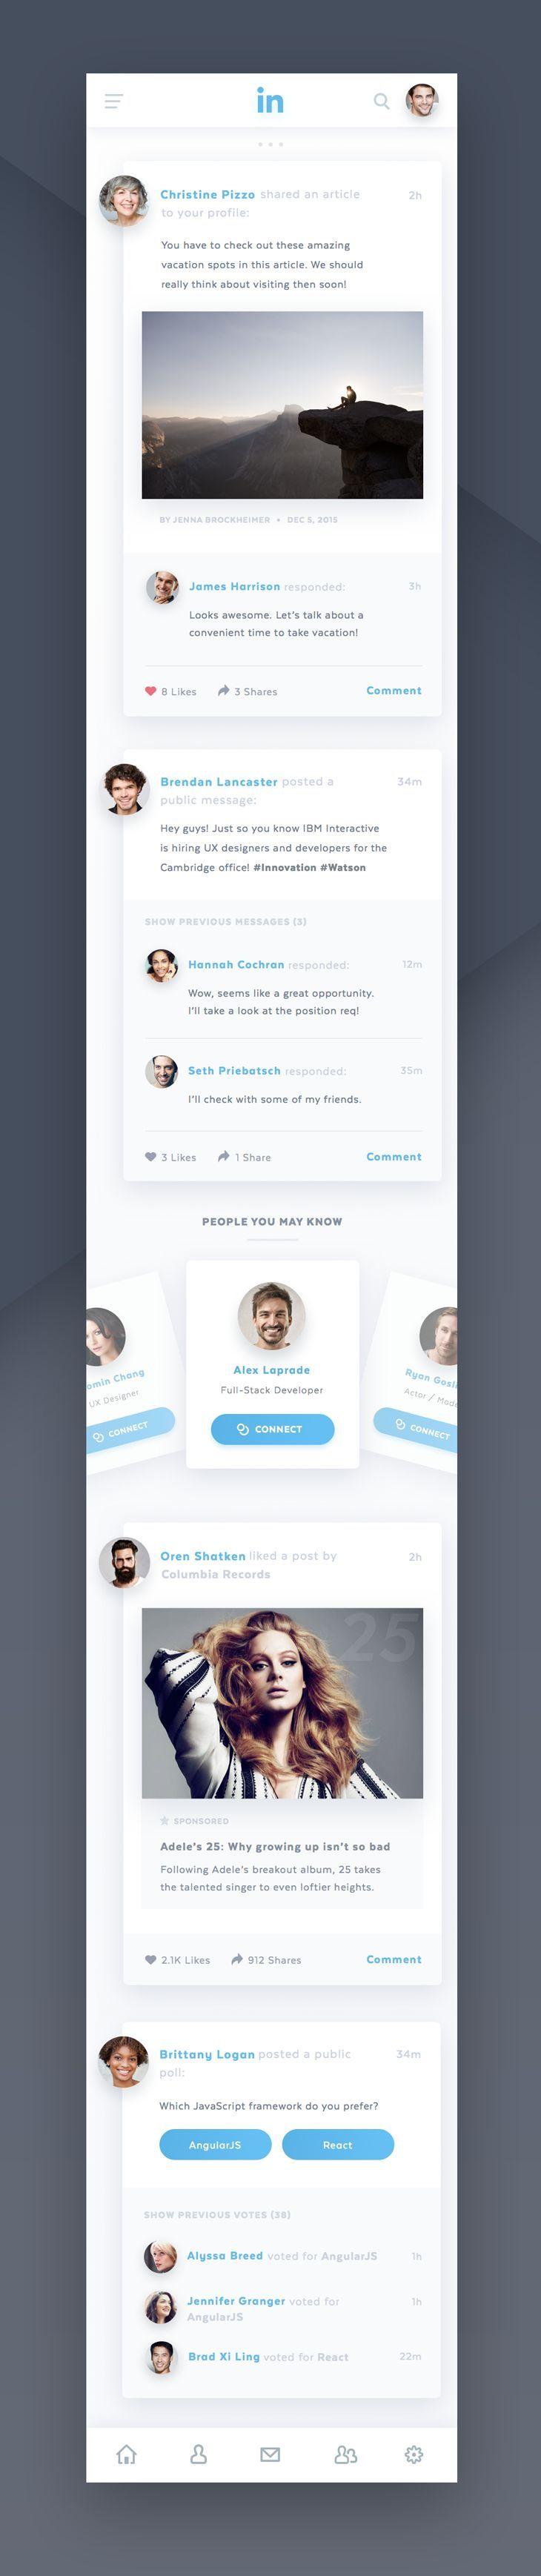 linkedin mobile app concept #mobile #ui #app